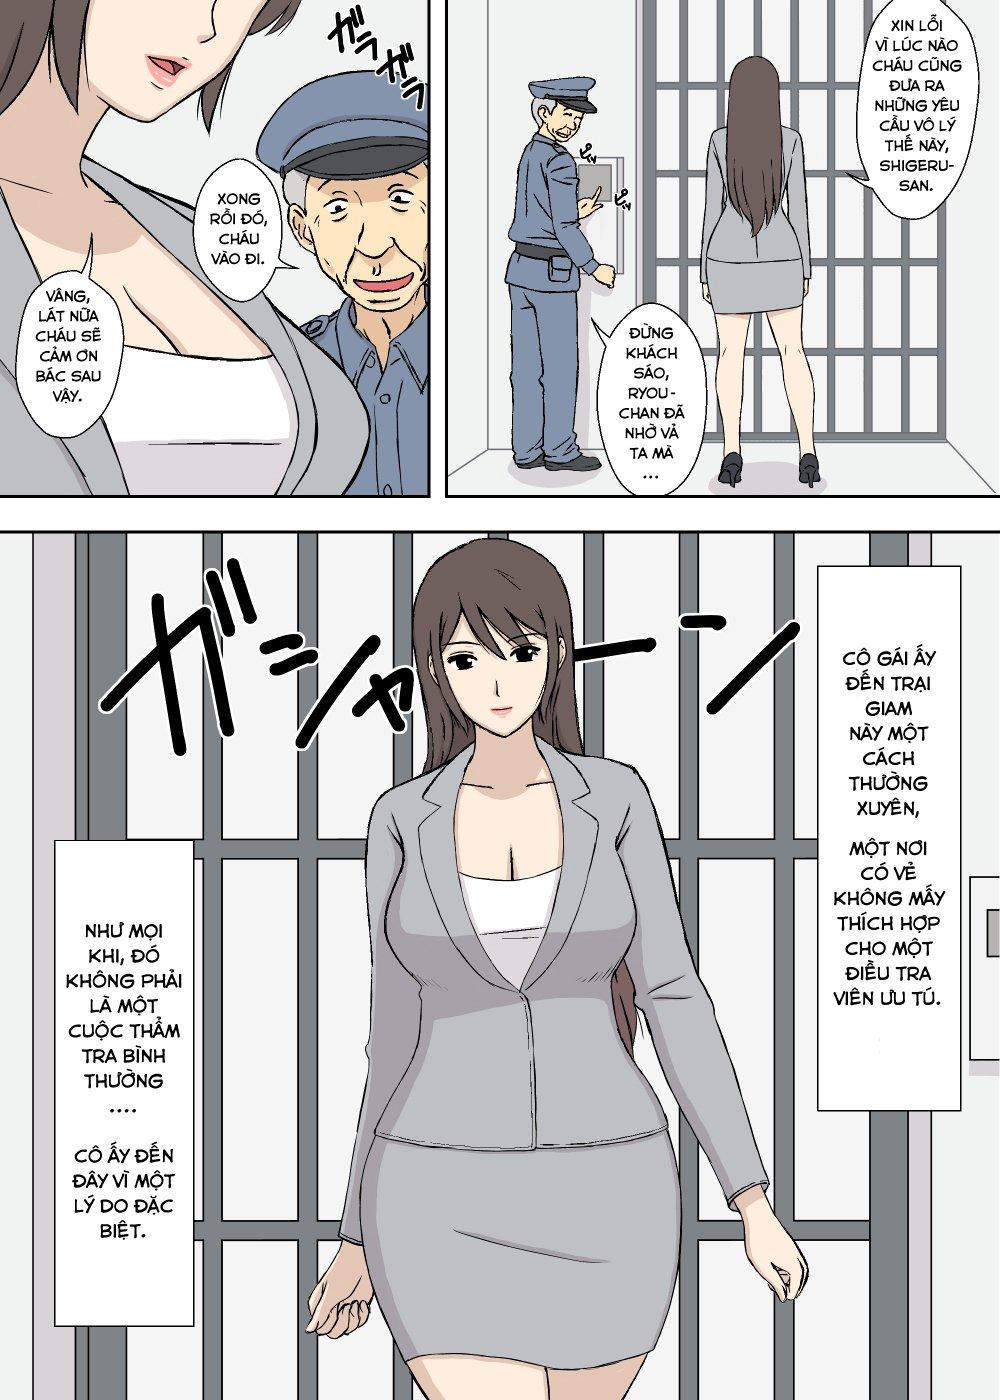 - Con Dâu Lăng Loàn - Truyện Hentai